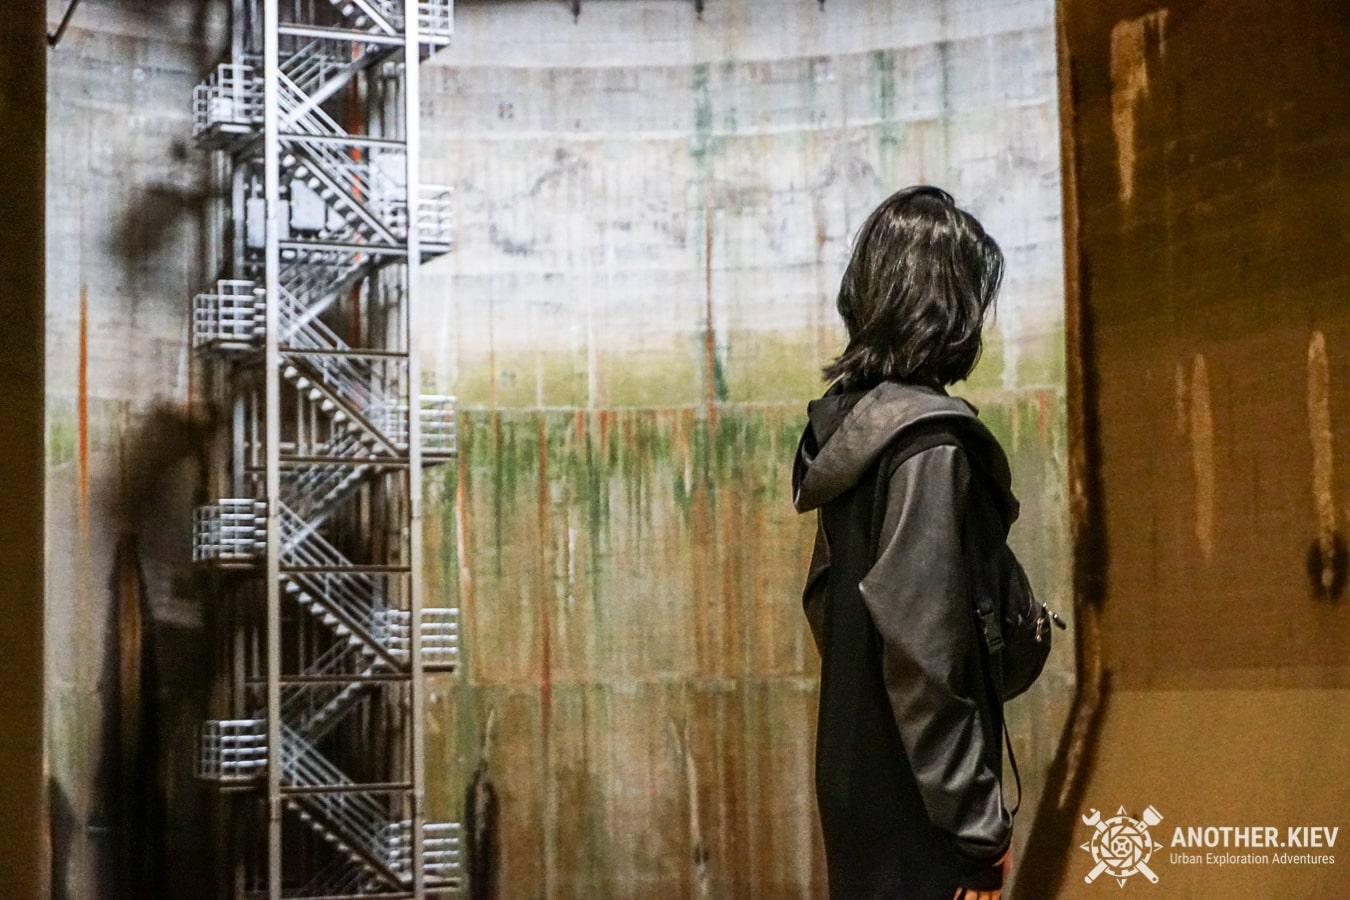 j-cans-urbex-tour-8-min Экскурсия в Токийский противопаводковый коллектор